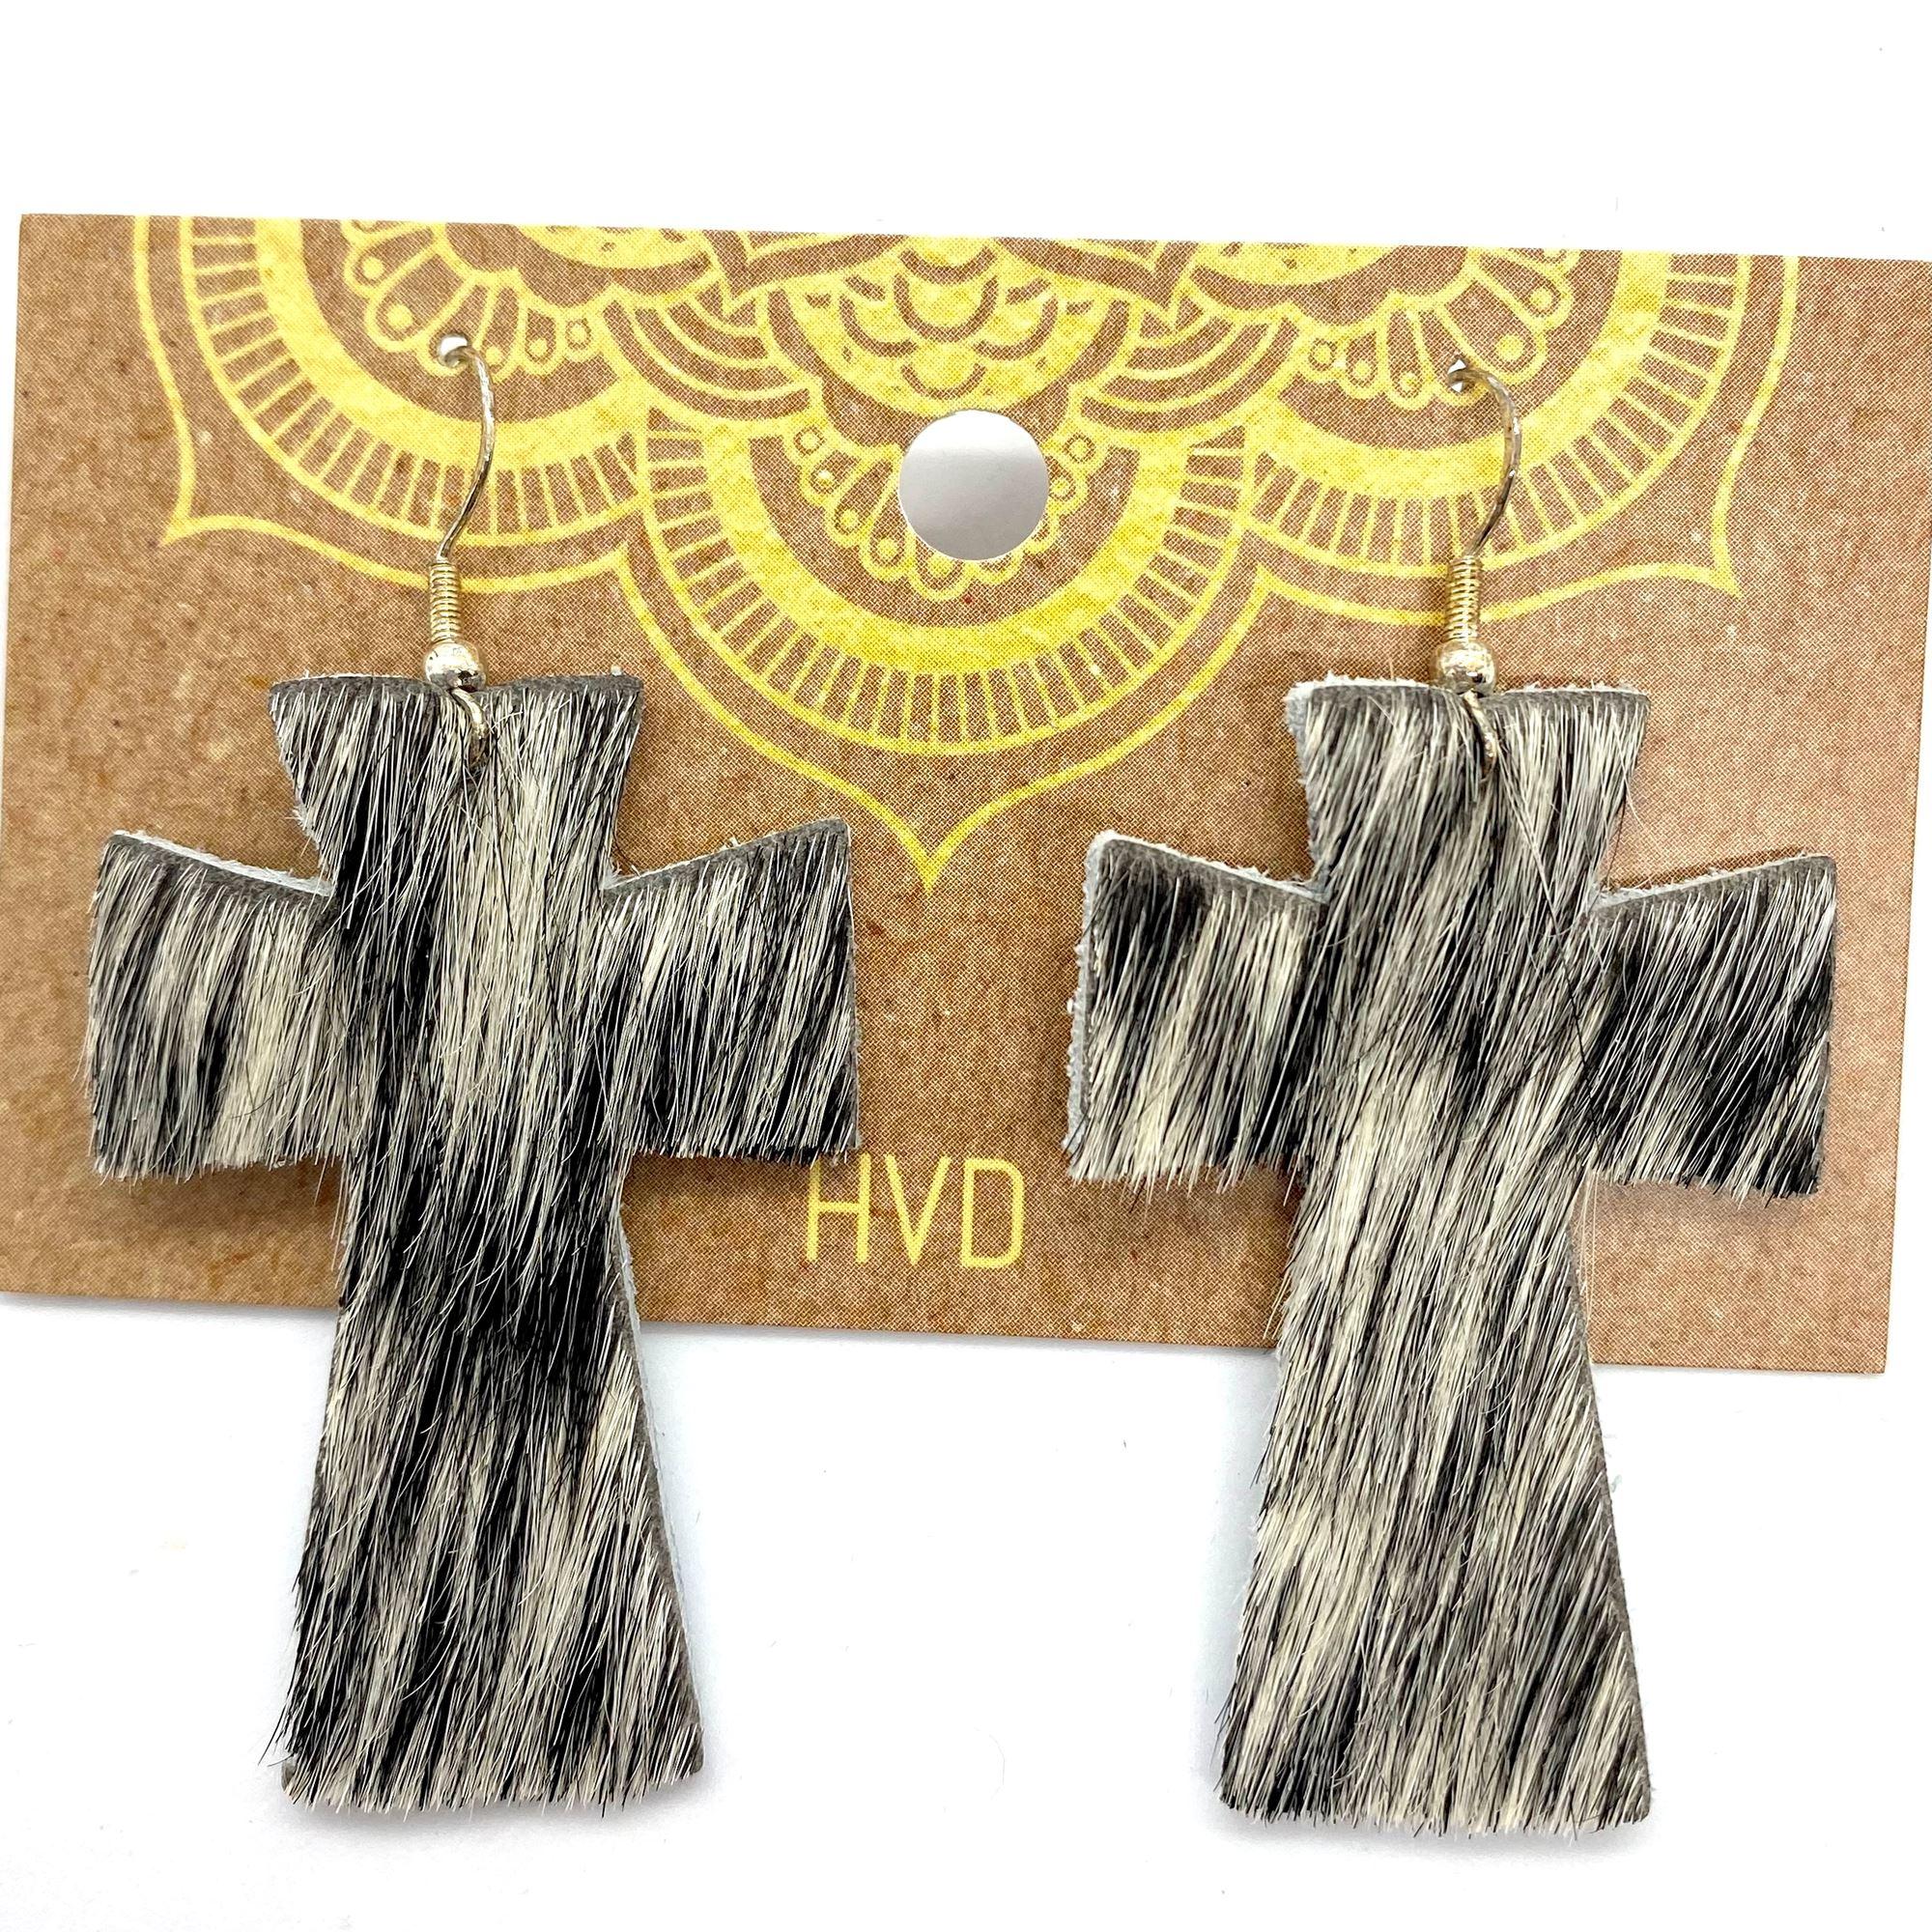 Black & White Hair-On-Hide Cross Earrings (4)